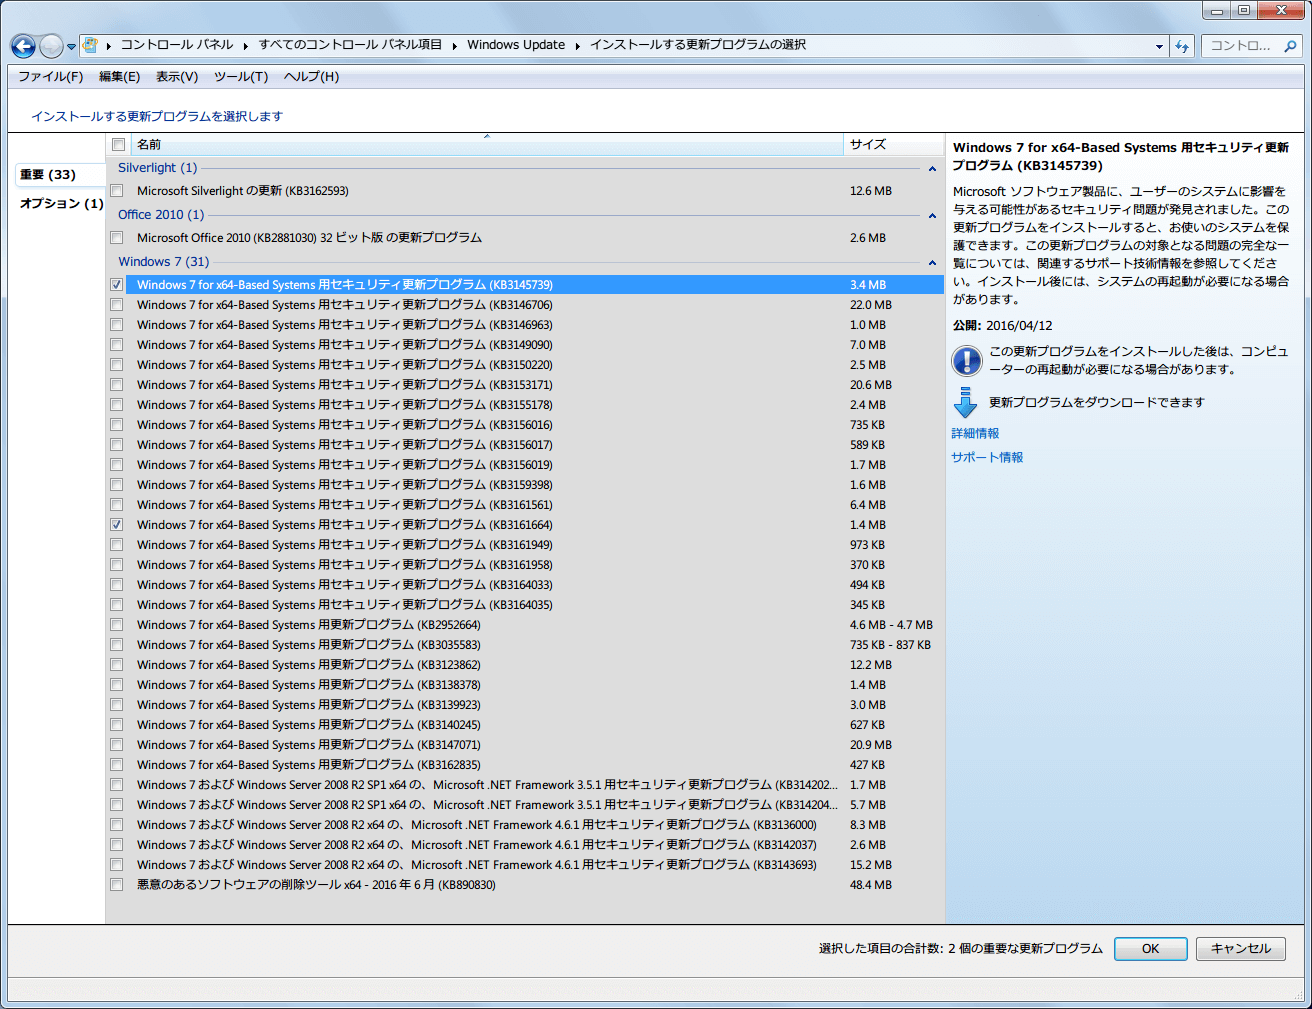 Windows 7 for x64-Based Systems 用セキュリティ更新プログラム KB3145739 公開:2016/04/12 Windows Update チェック時間短縮のため先にインストール